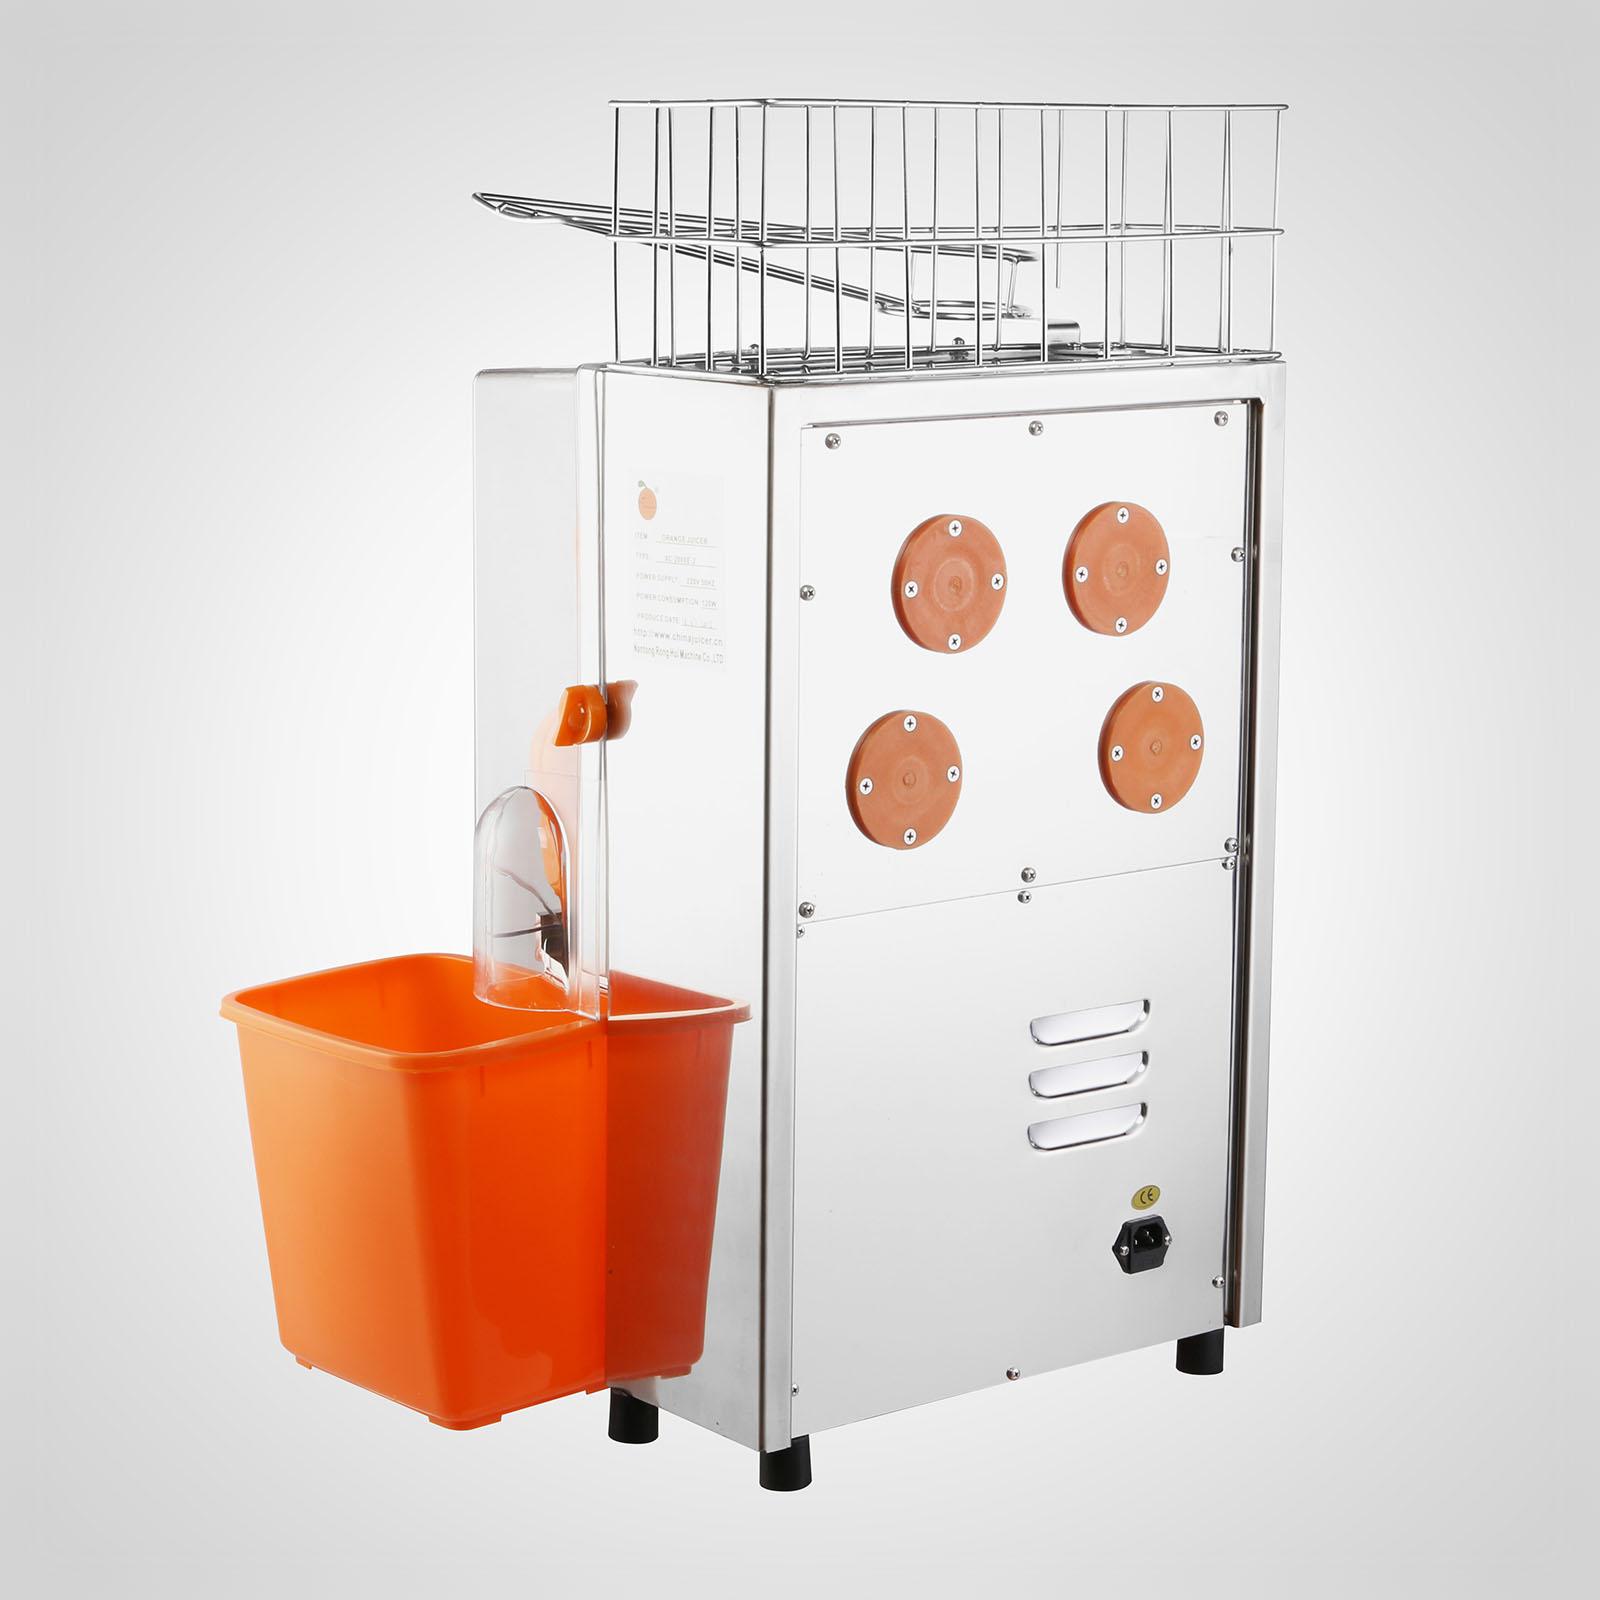 commercial orange juice squeezer machine lemon fruit squeezer juicer extractor ebay. Black Bedroom Furniture Sets. Home Design Ideas